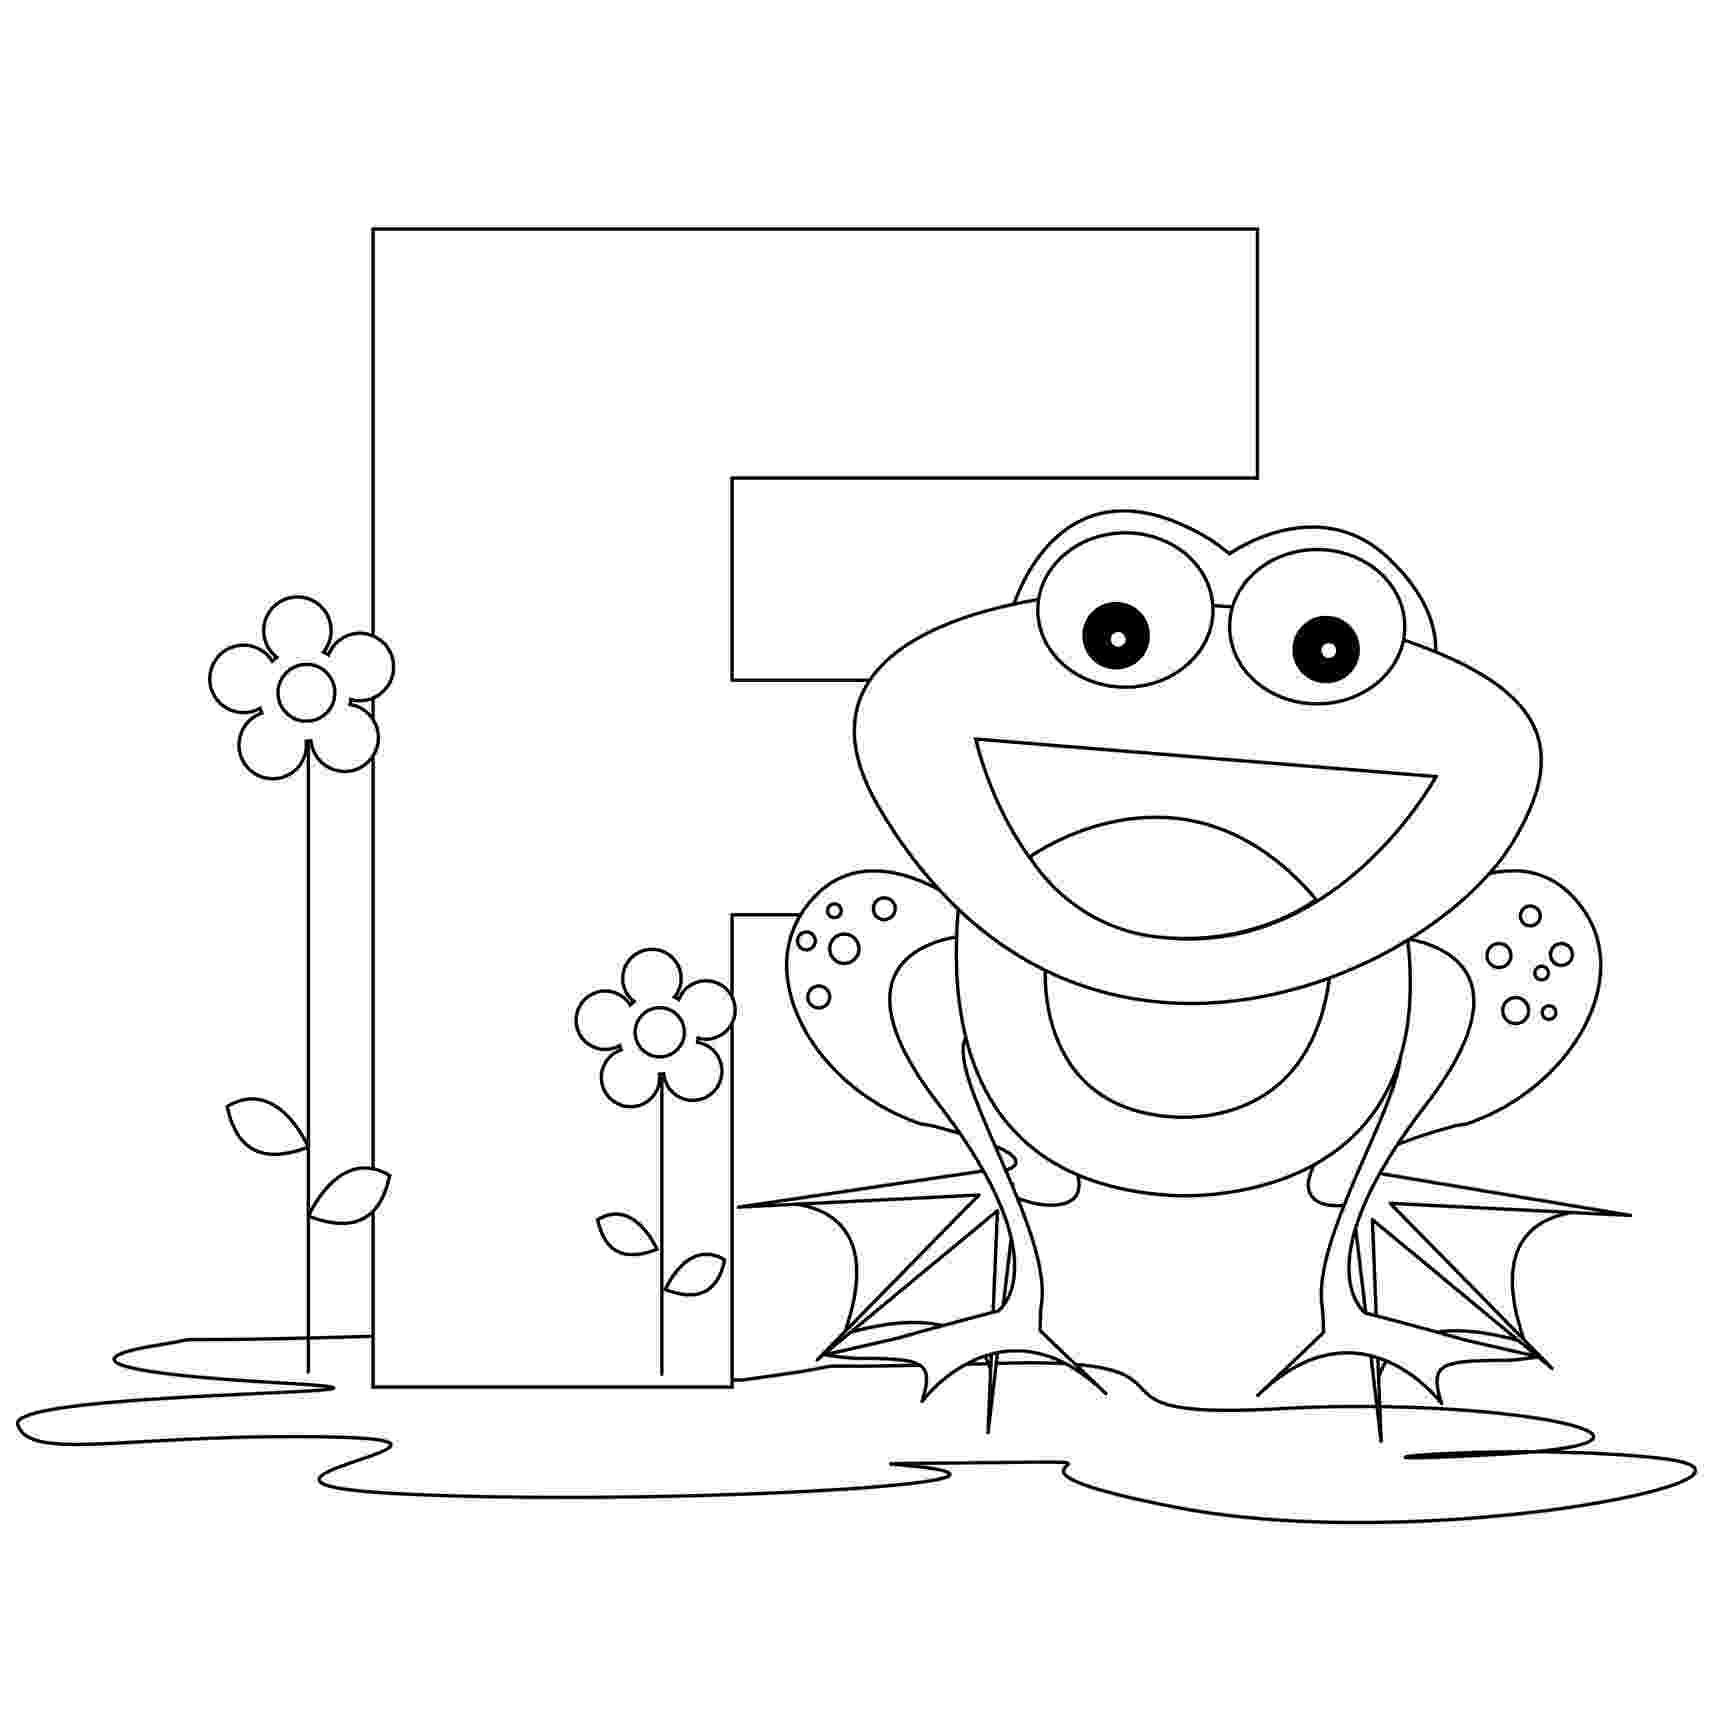 abc coloring book printable free printable alphabet book pdf printables for preschool abc printable coloring book